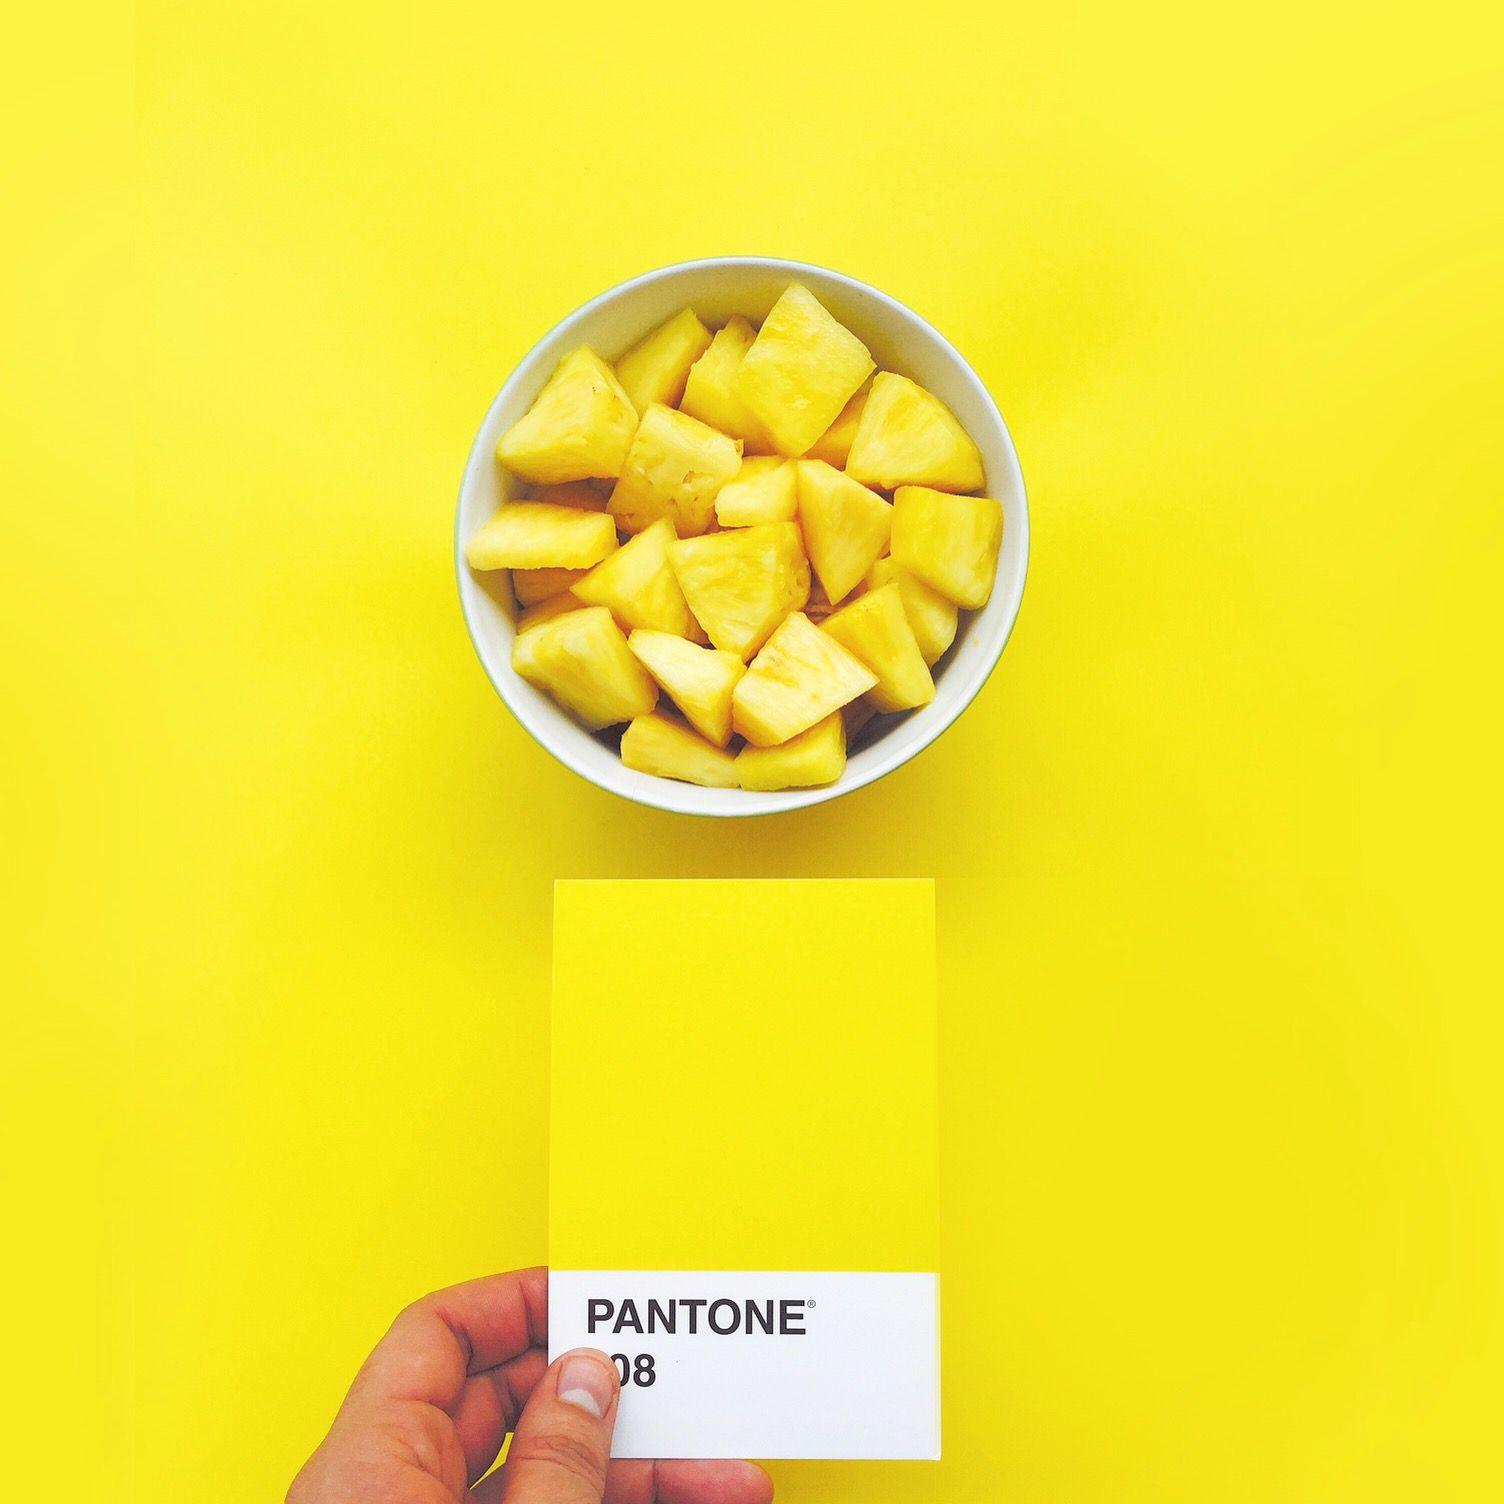 Pantone 108 PanamaPantone Yellow Color Pineapple Panama